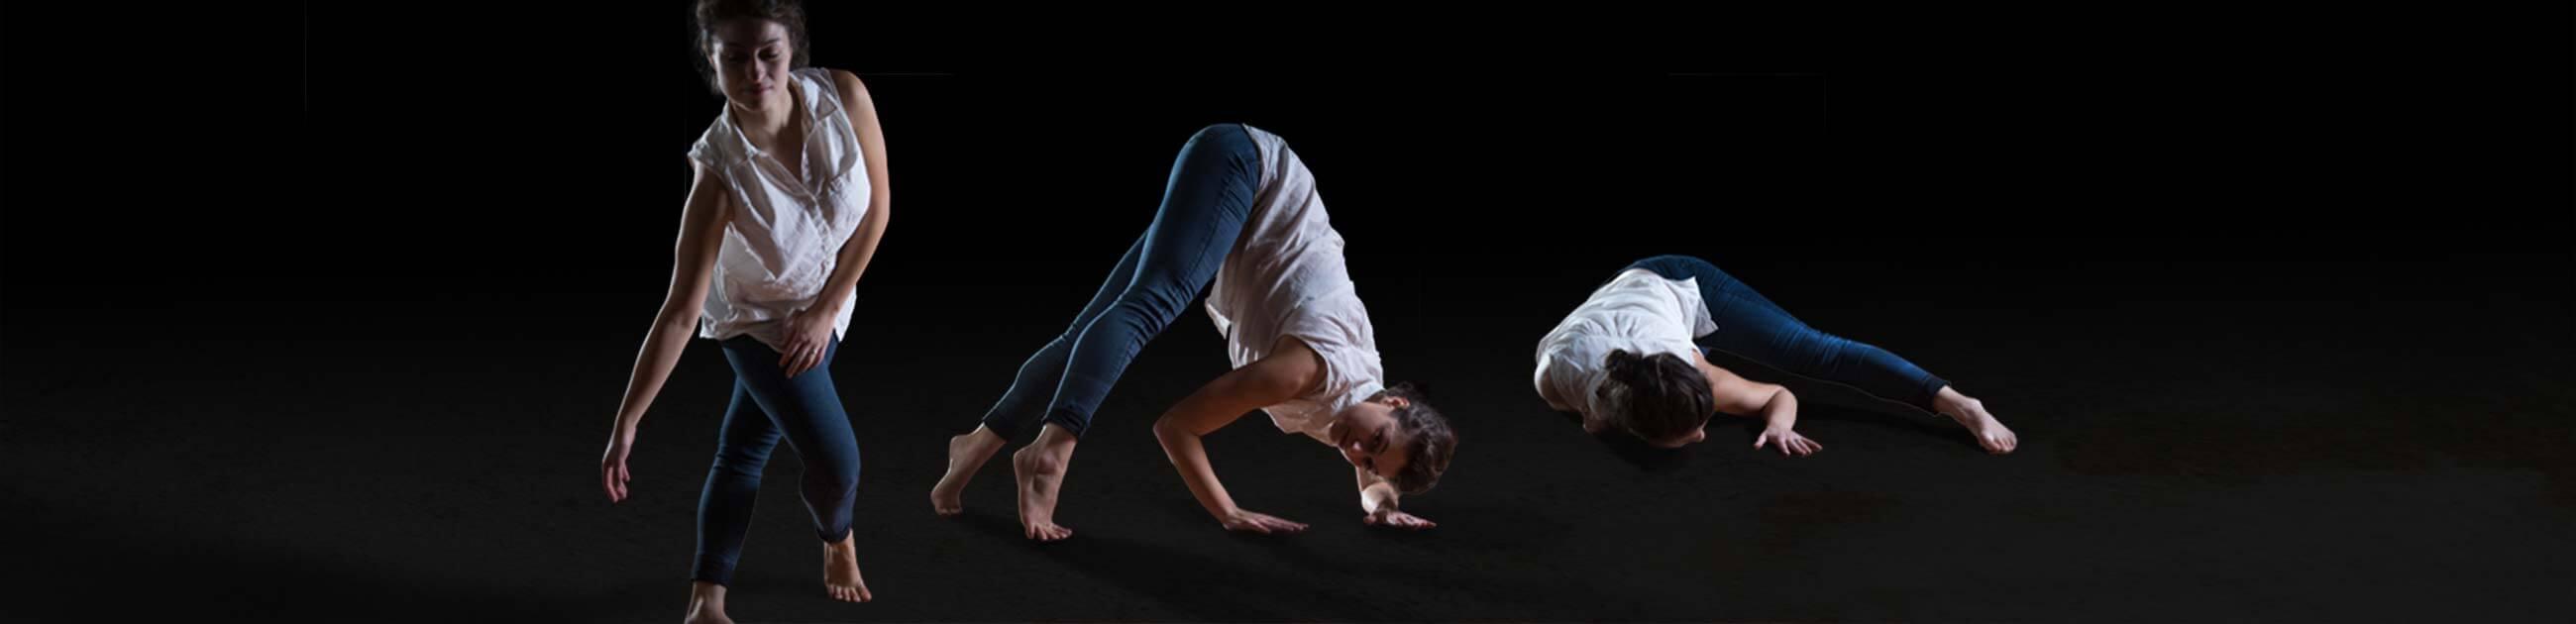 Contemporary Tanzen lernen in Kiel - Tanzschule K-System